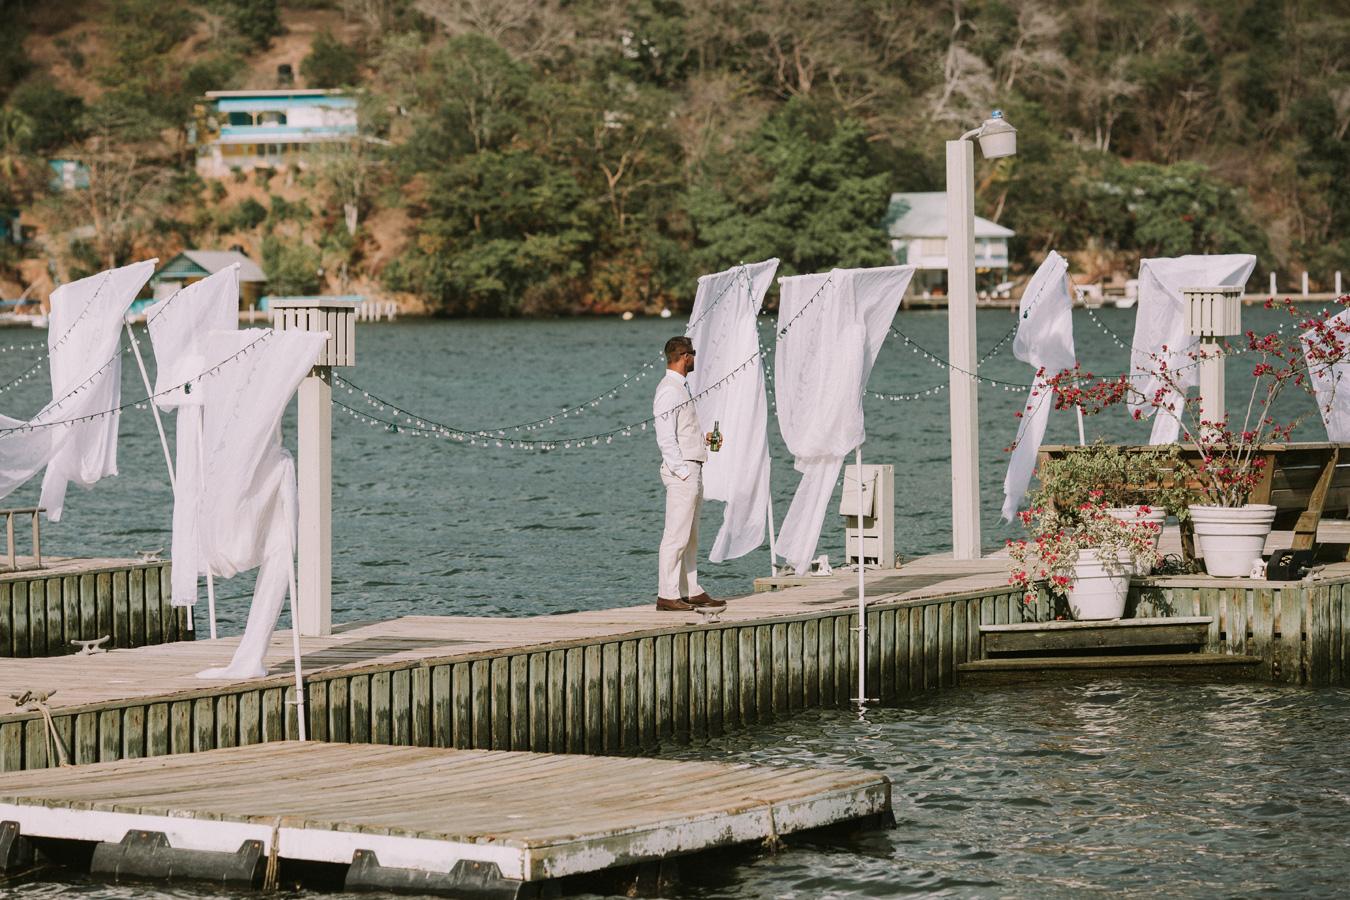 018-destinasjonsbryllup-bryllup-i-utlandet-tone-tvedt.jpg